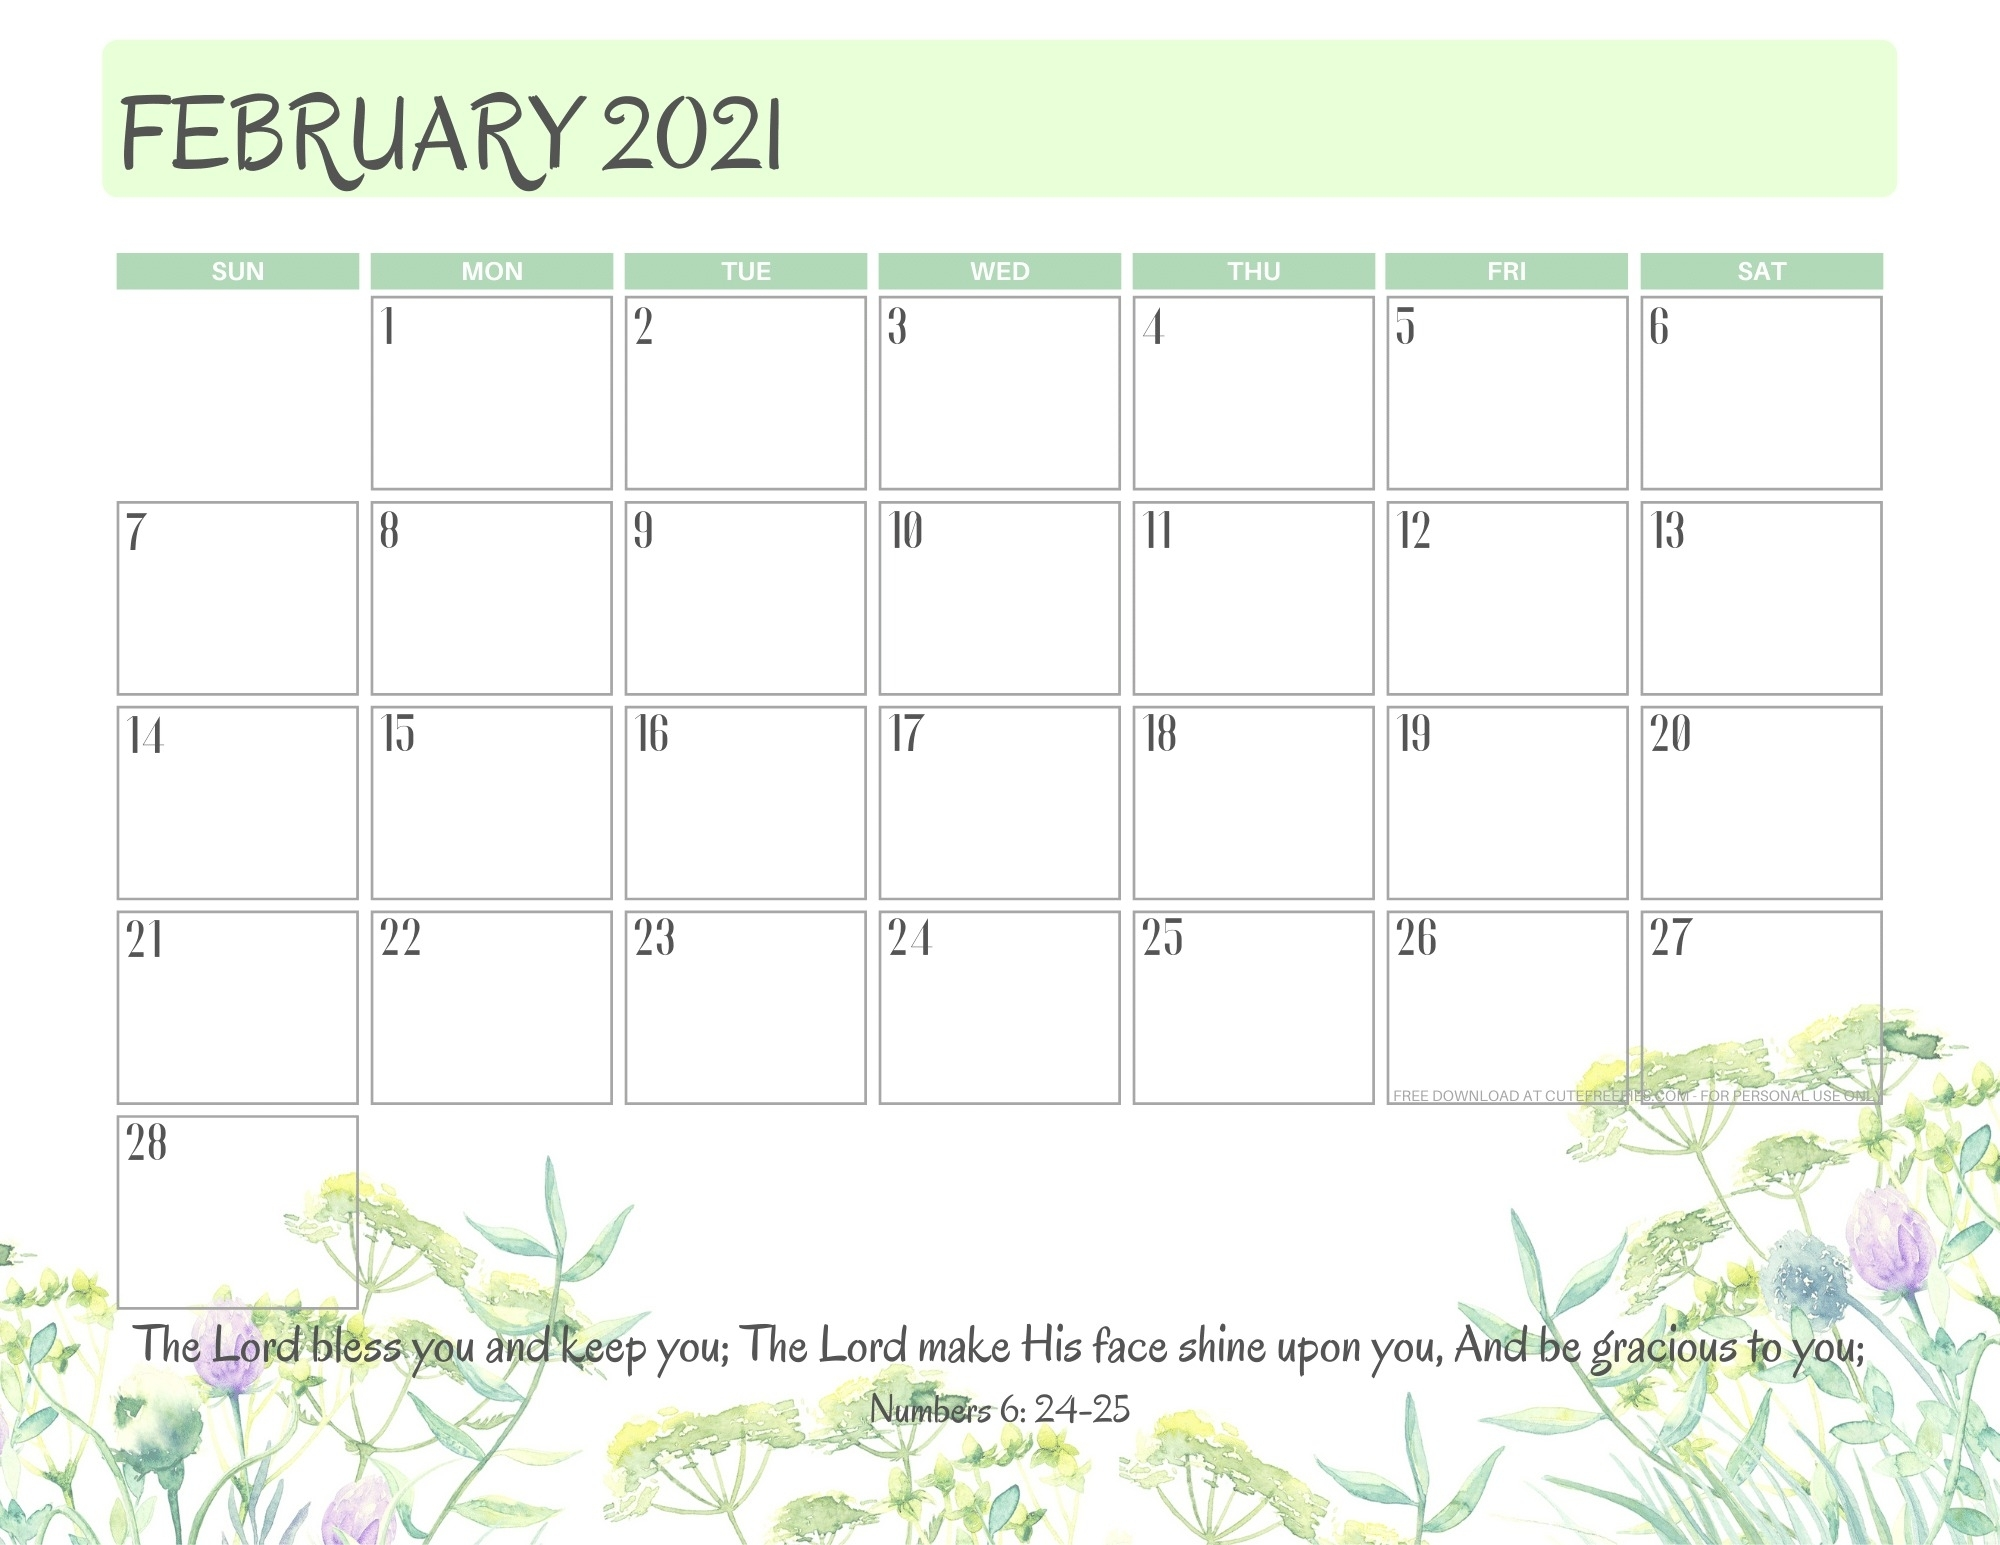 2021 Bible Verse Calendar Free Printable! - Cute Freebies